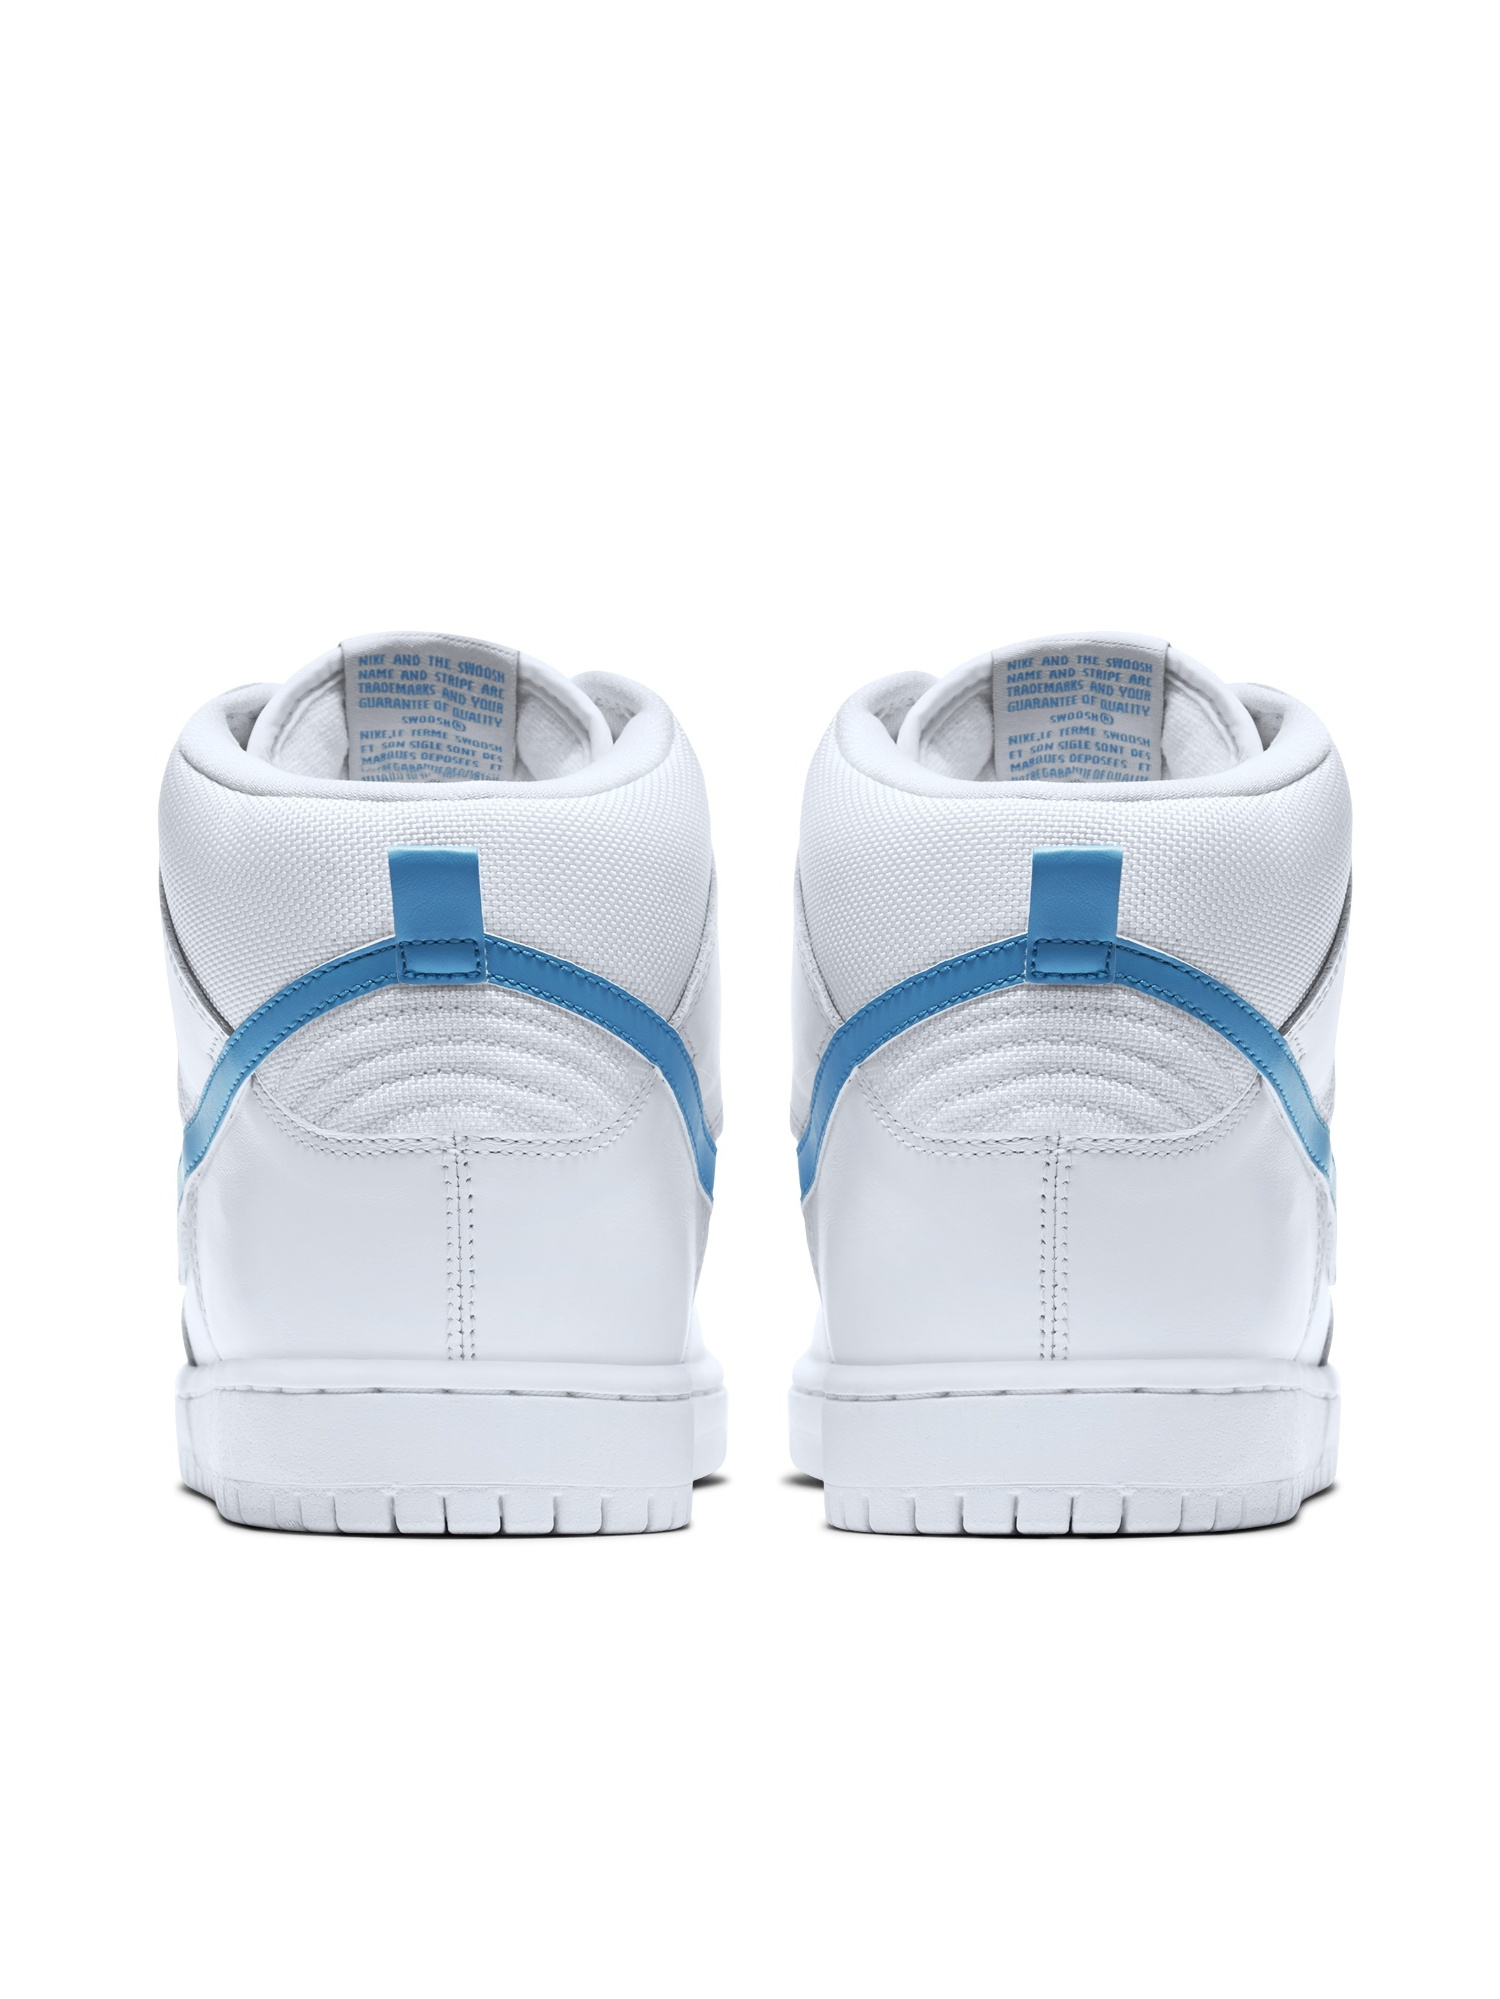 5d6ee0231e Nike - Mens Nike SB Dunk High TRD QS Richard Mulder White Orion Blue 881758-1  - Walmart.com